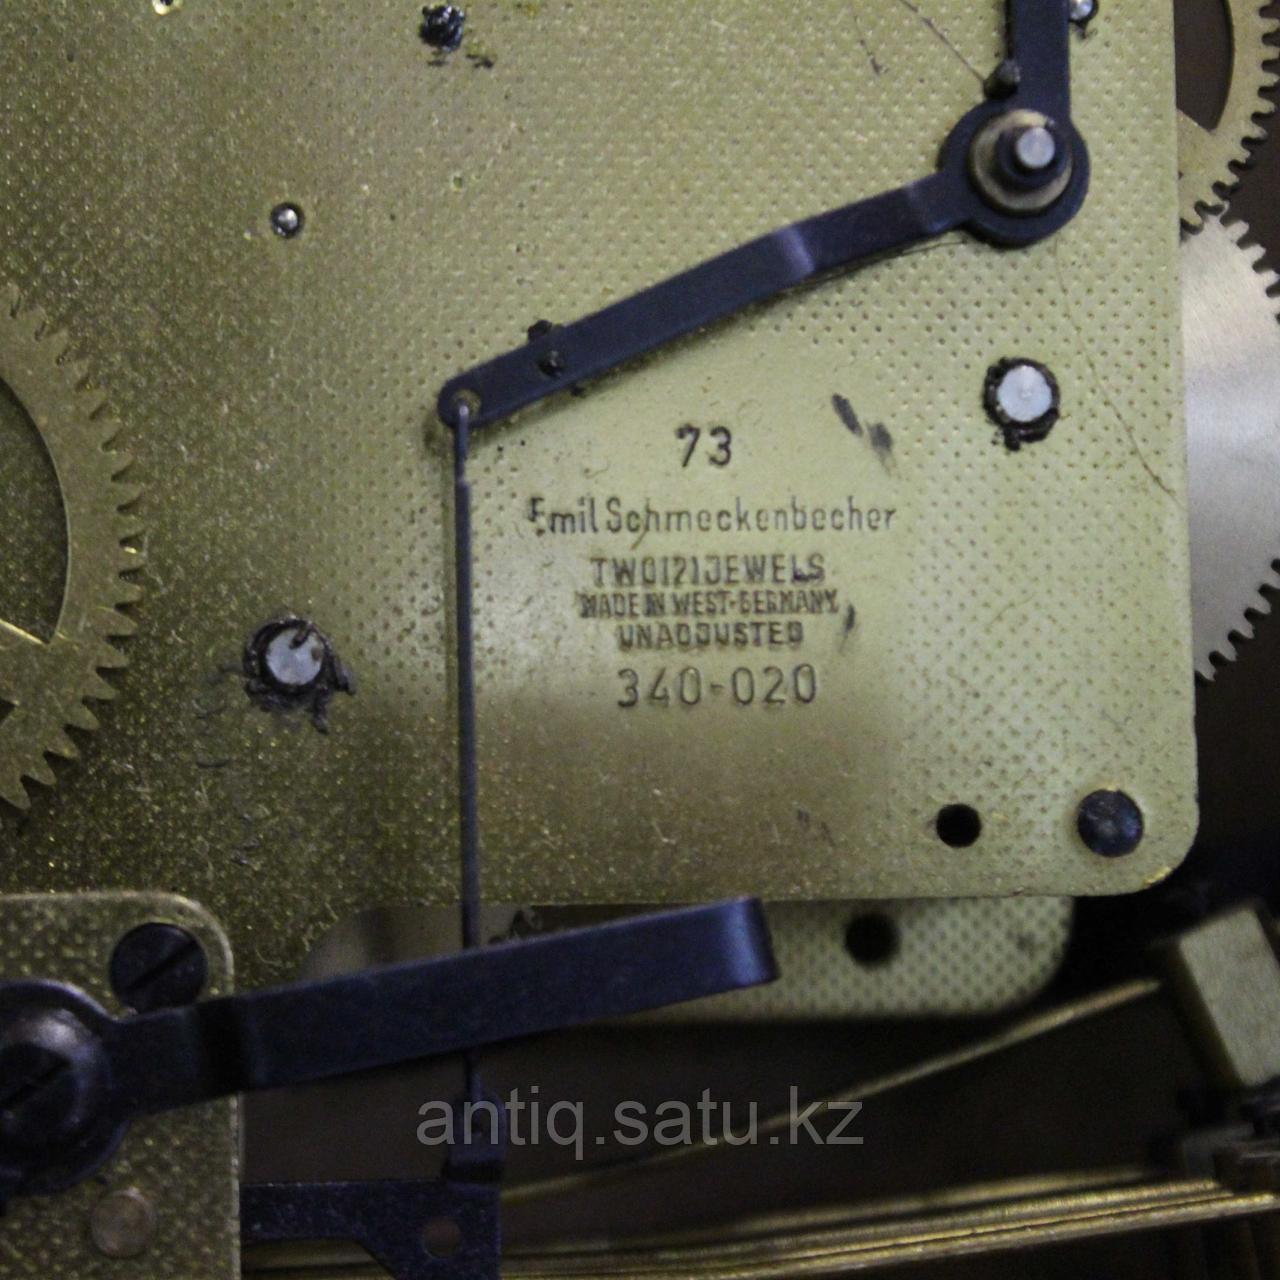 Настольные часы Часовая мастерская Emil Schmeckenbecher - фото 3